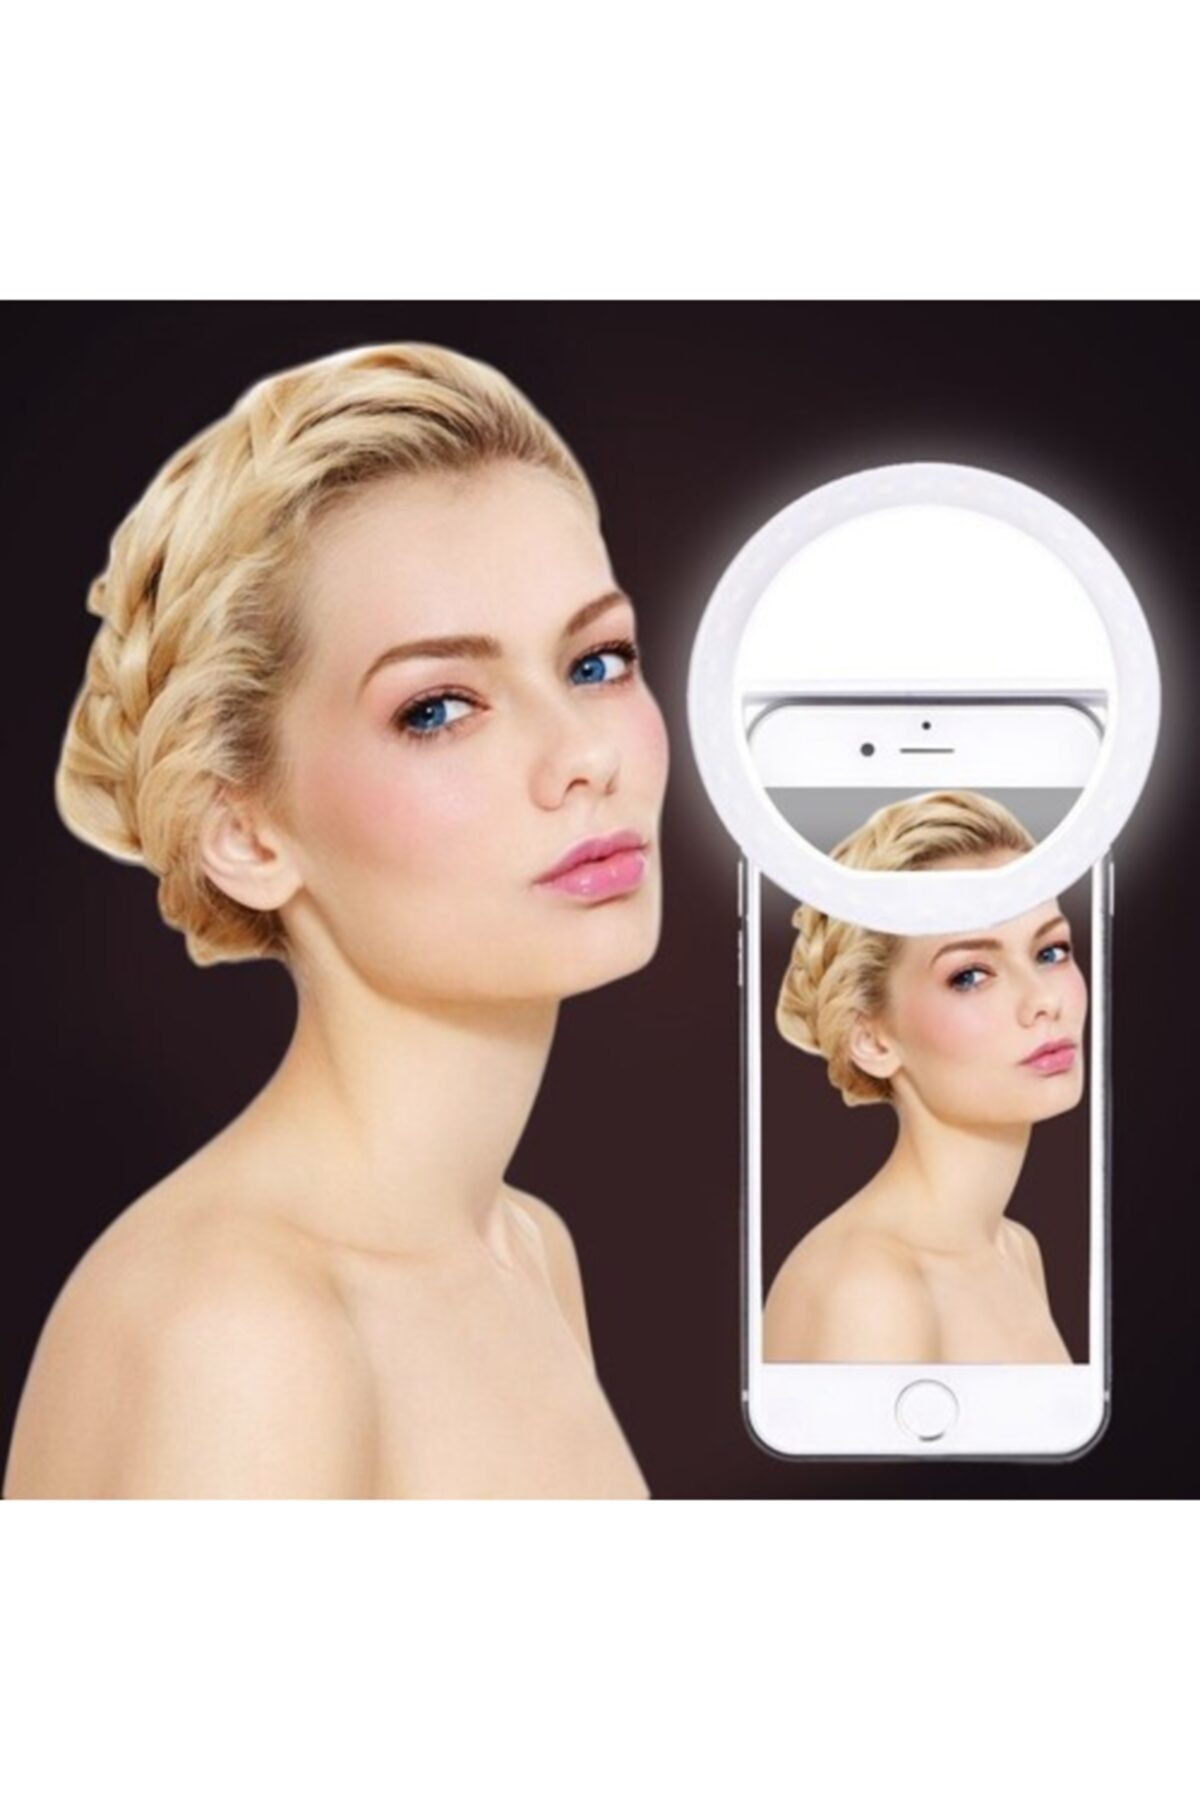 Soffany Genx Selfie Işığı 3 Kademeli Led Aydınlatma Telefon Aparatı 2